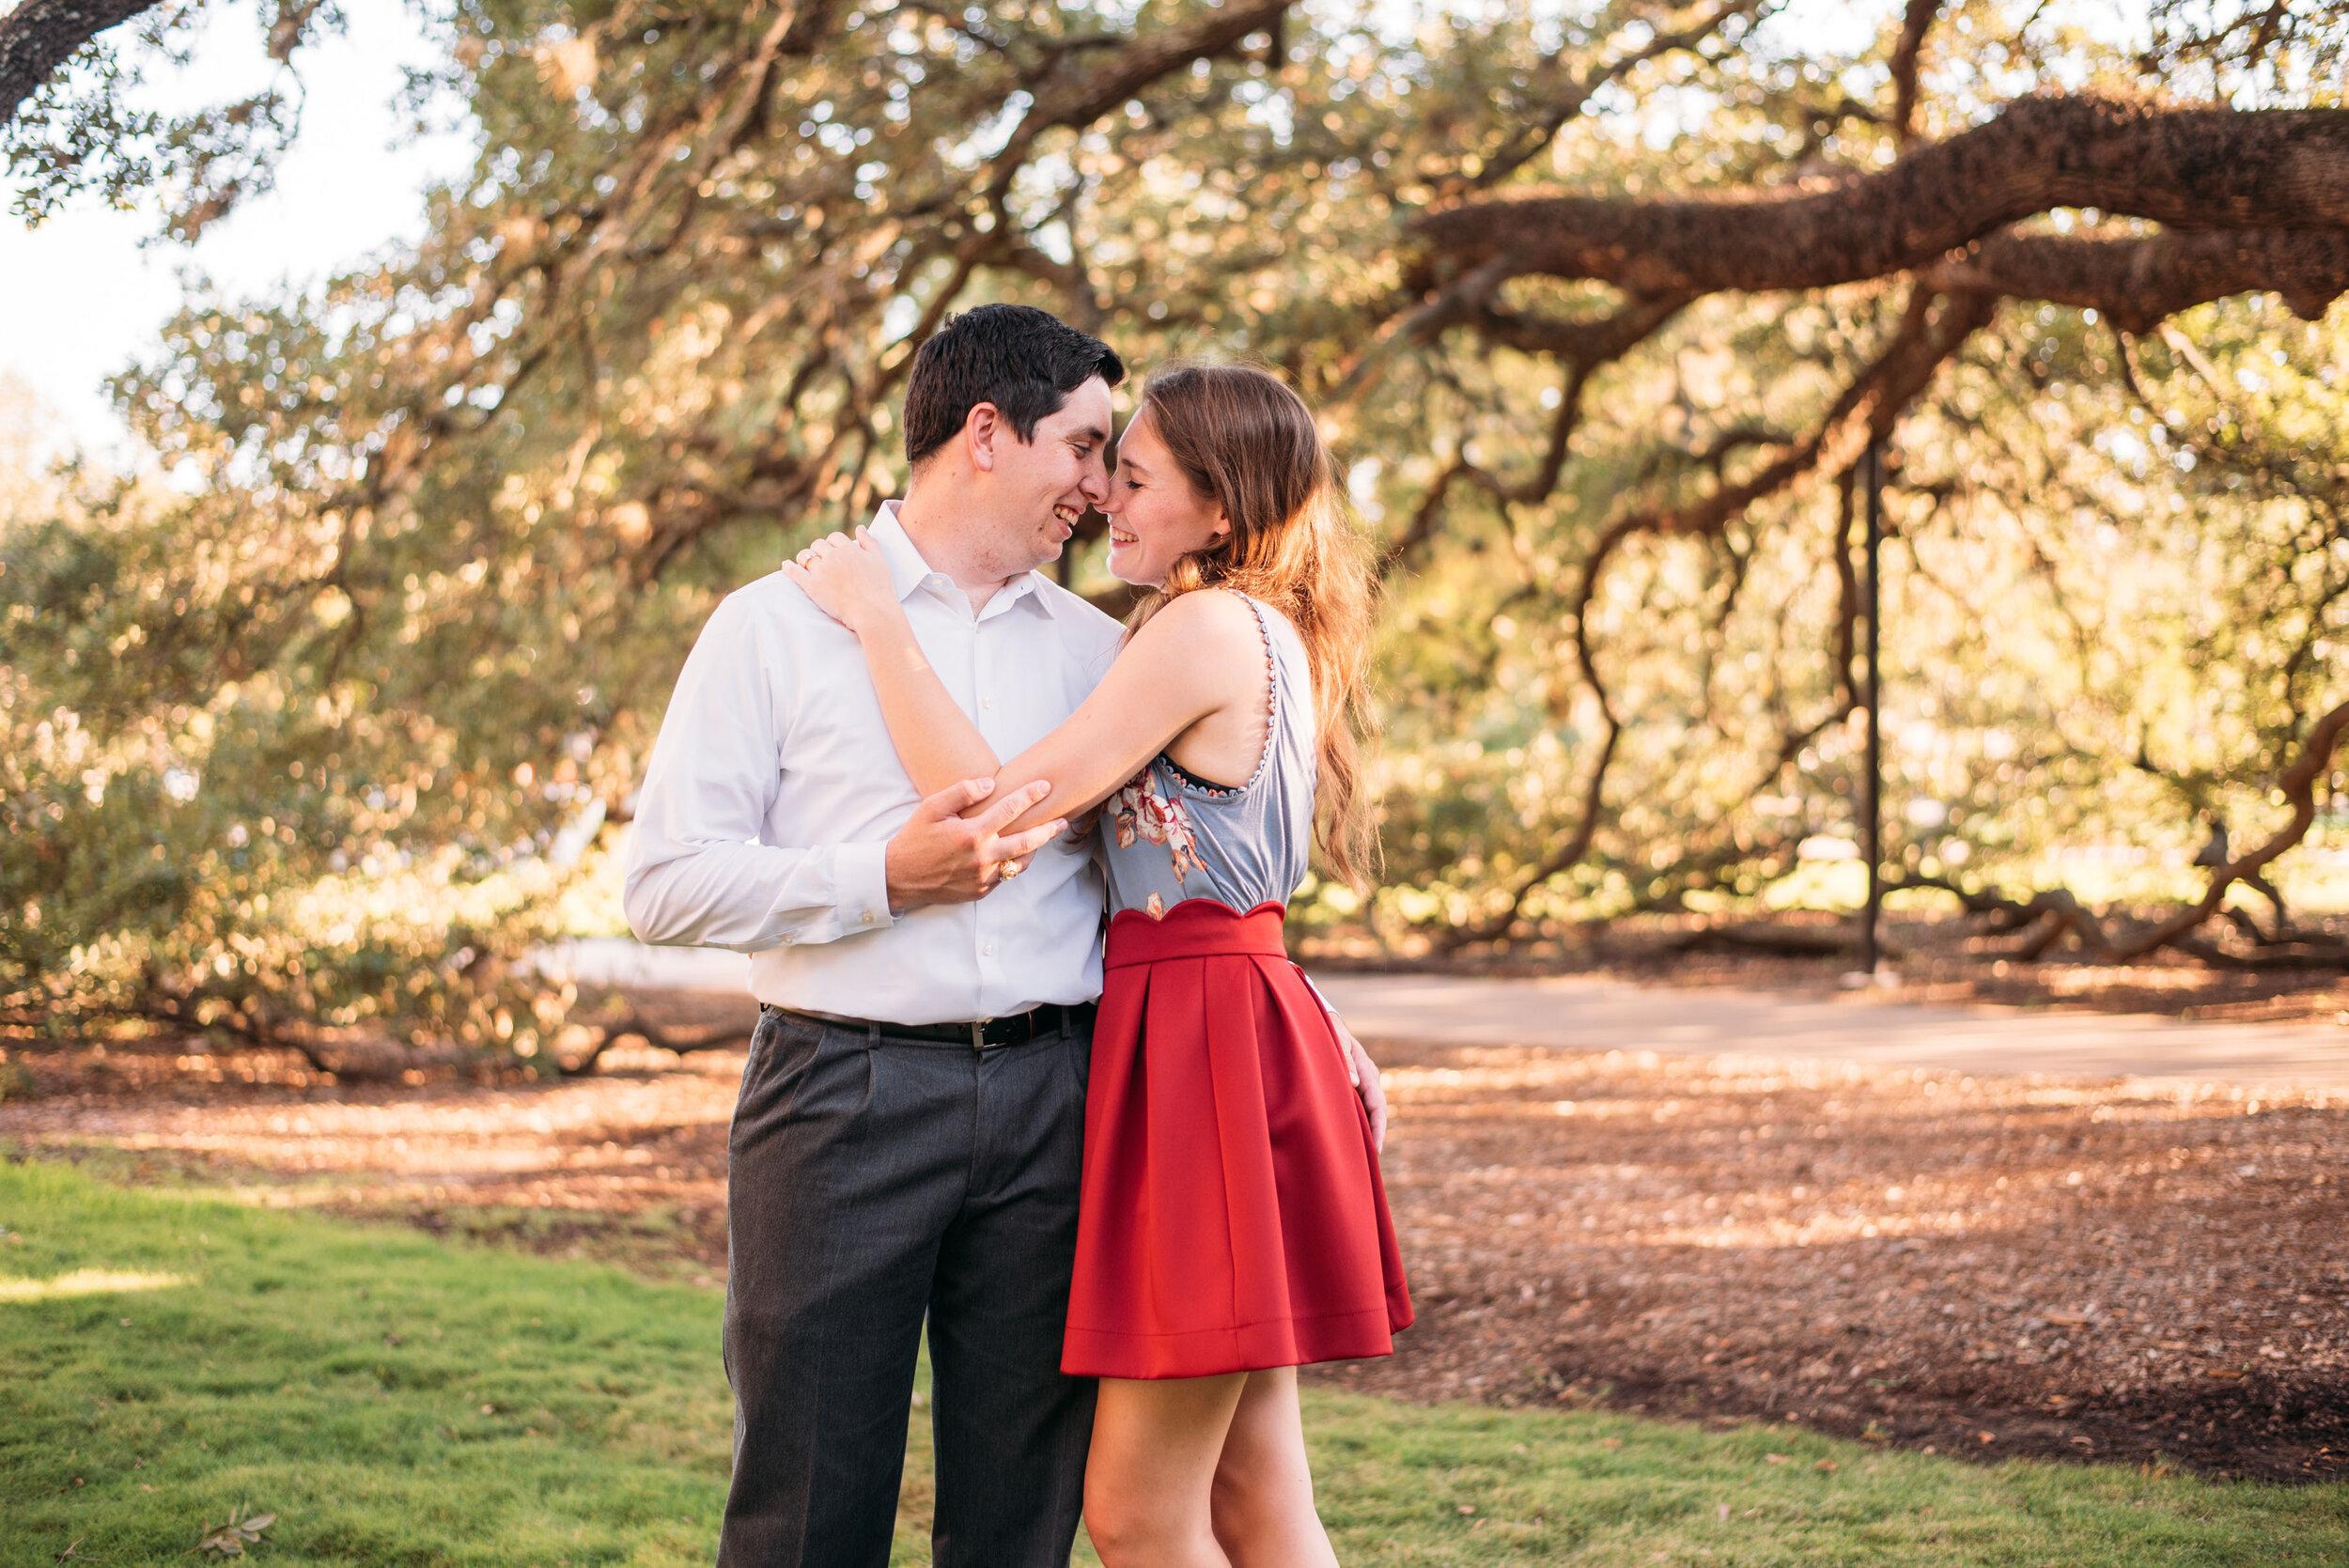 Texas-A&M-University-Engagement-Session-Century-Tree-Military-Walk-College-Station-Wedding-Photographer-San-Angel-Photo-Tony-Kate-04.jpg